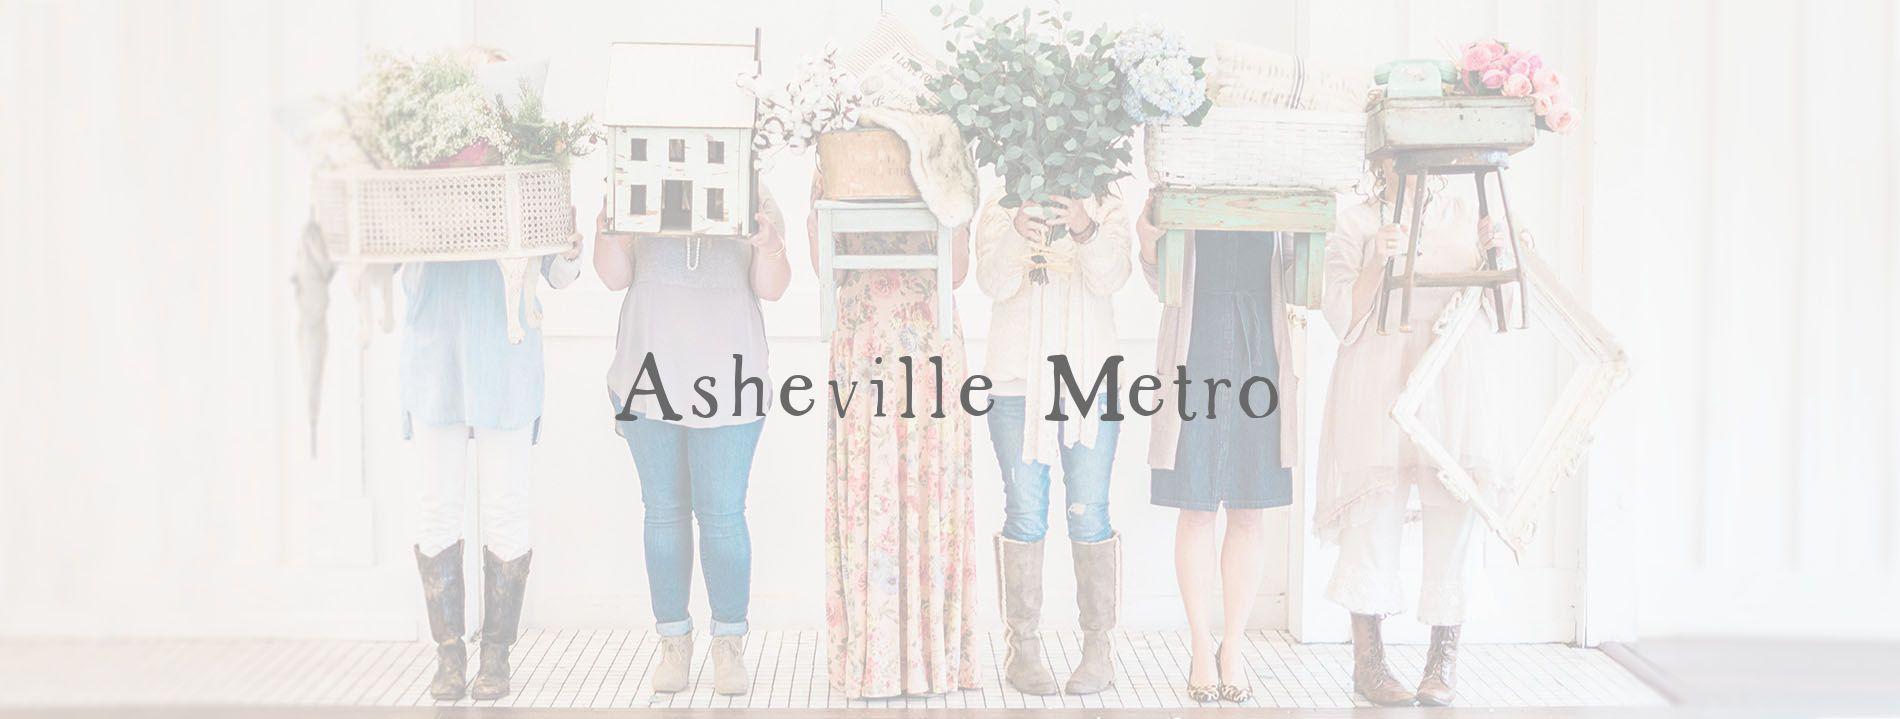 Asheville Metro